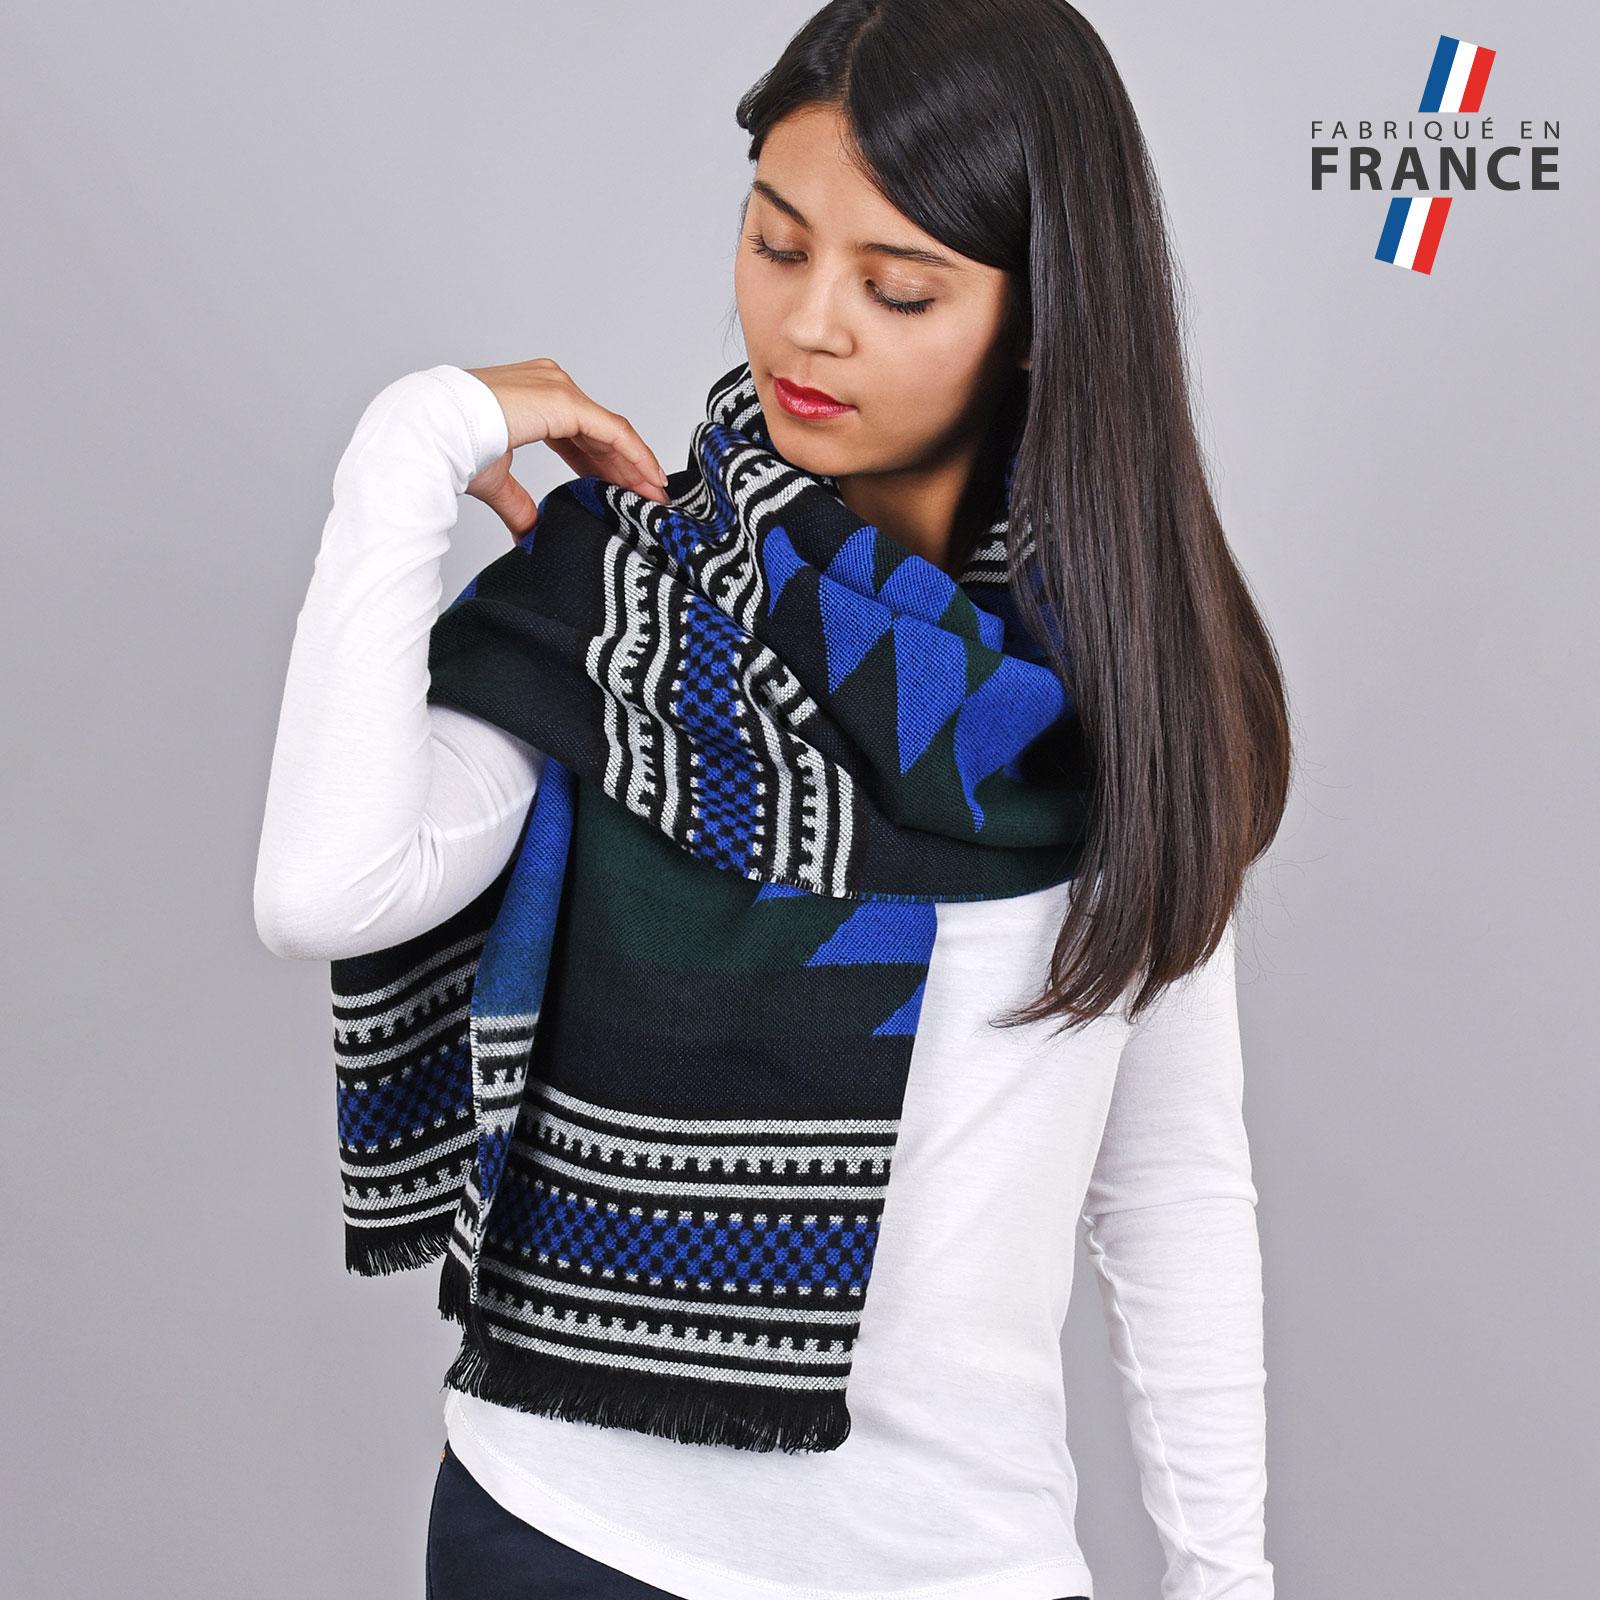 AT-04158-VF16-1-LB_FR-chale-hiver-bleu-marine